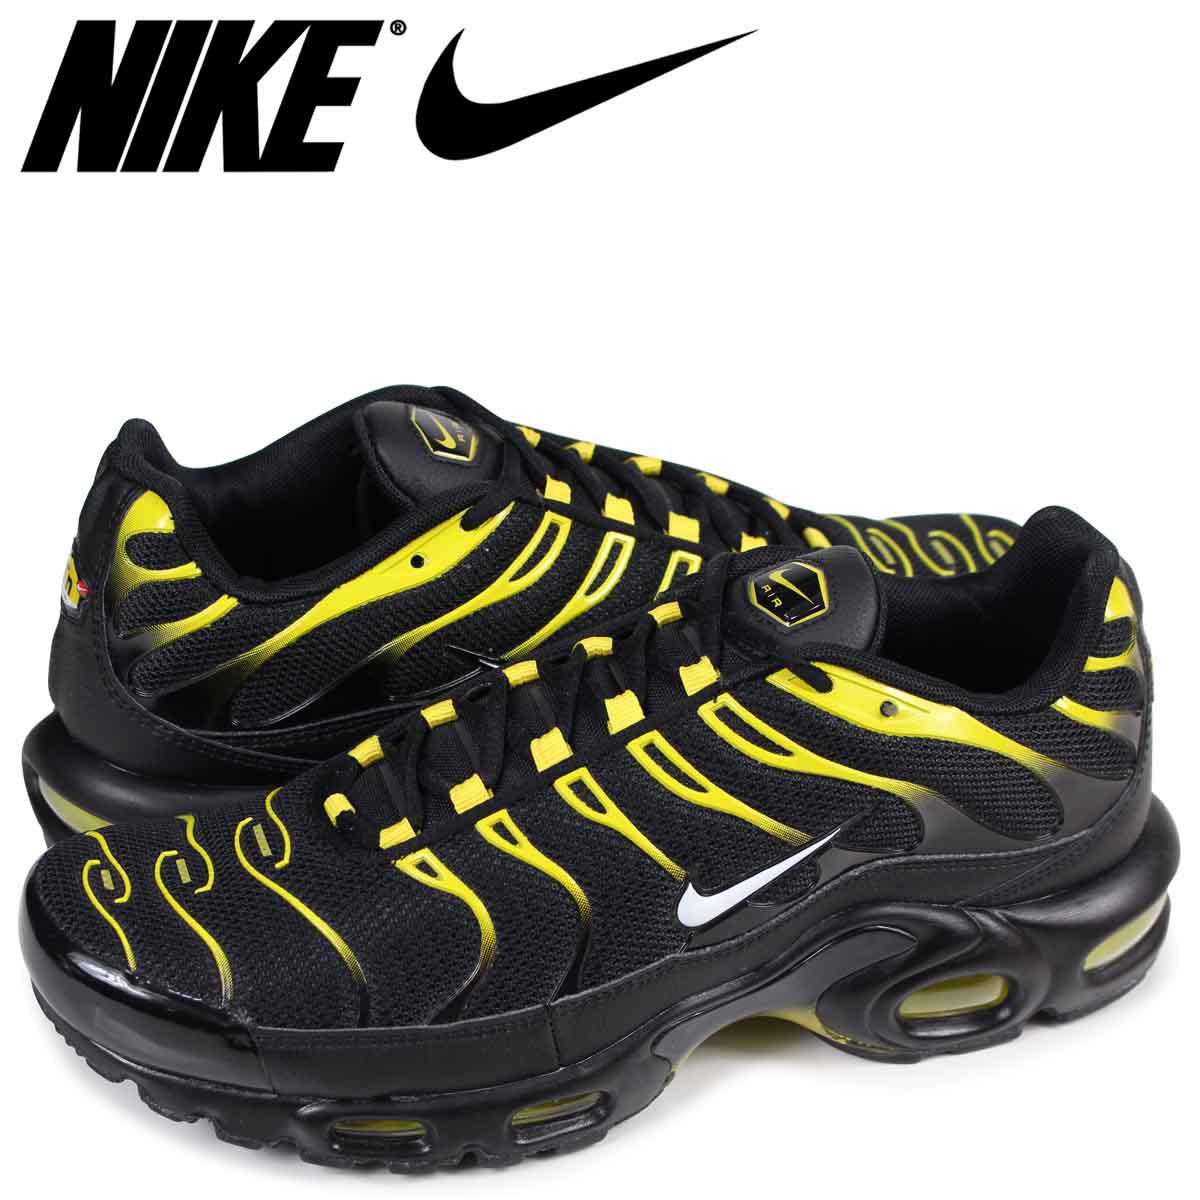 NIKE AIR MAX PLUS Kie Ney AMAX plus sneakers men 852,630 020 black